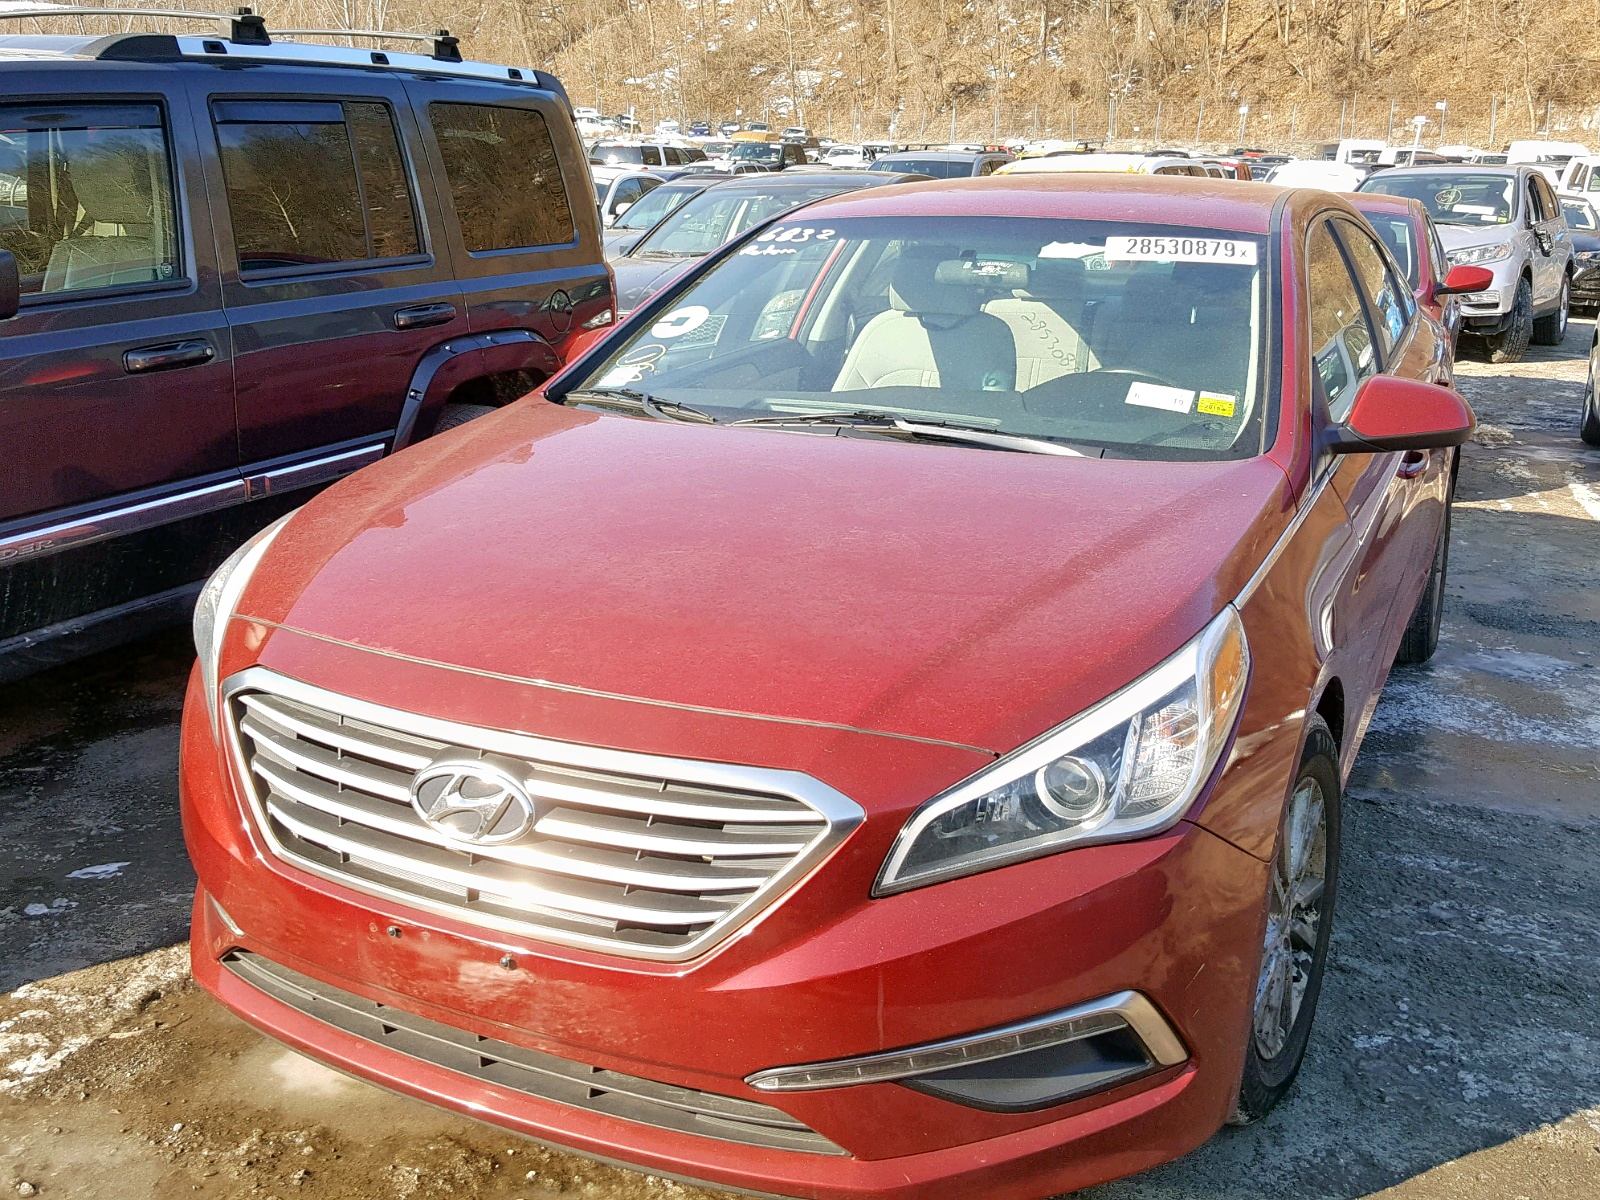 5NPE24AF9FH081103 - 2015 Hyundai Sonata Se 2.4L Right View